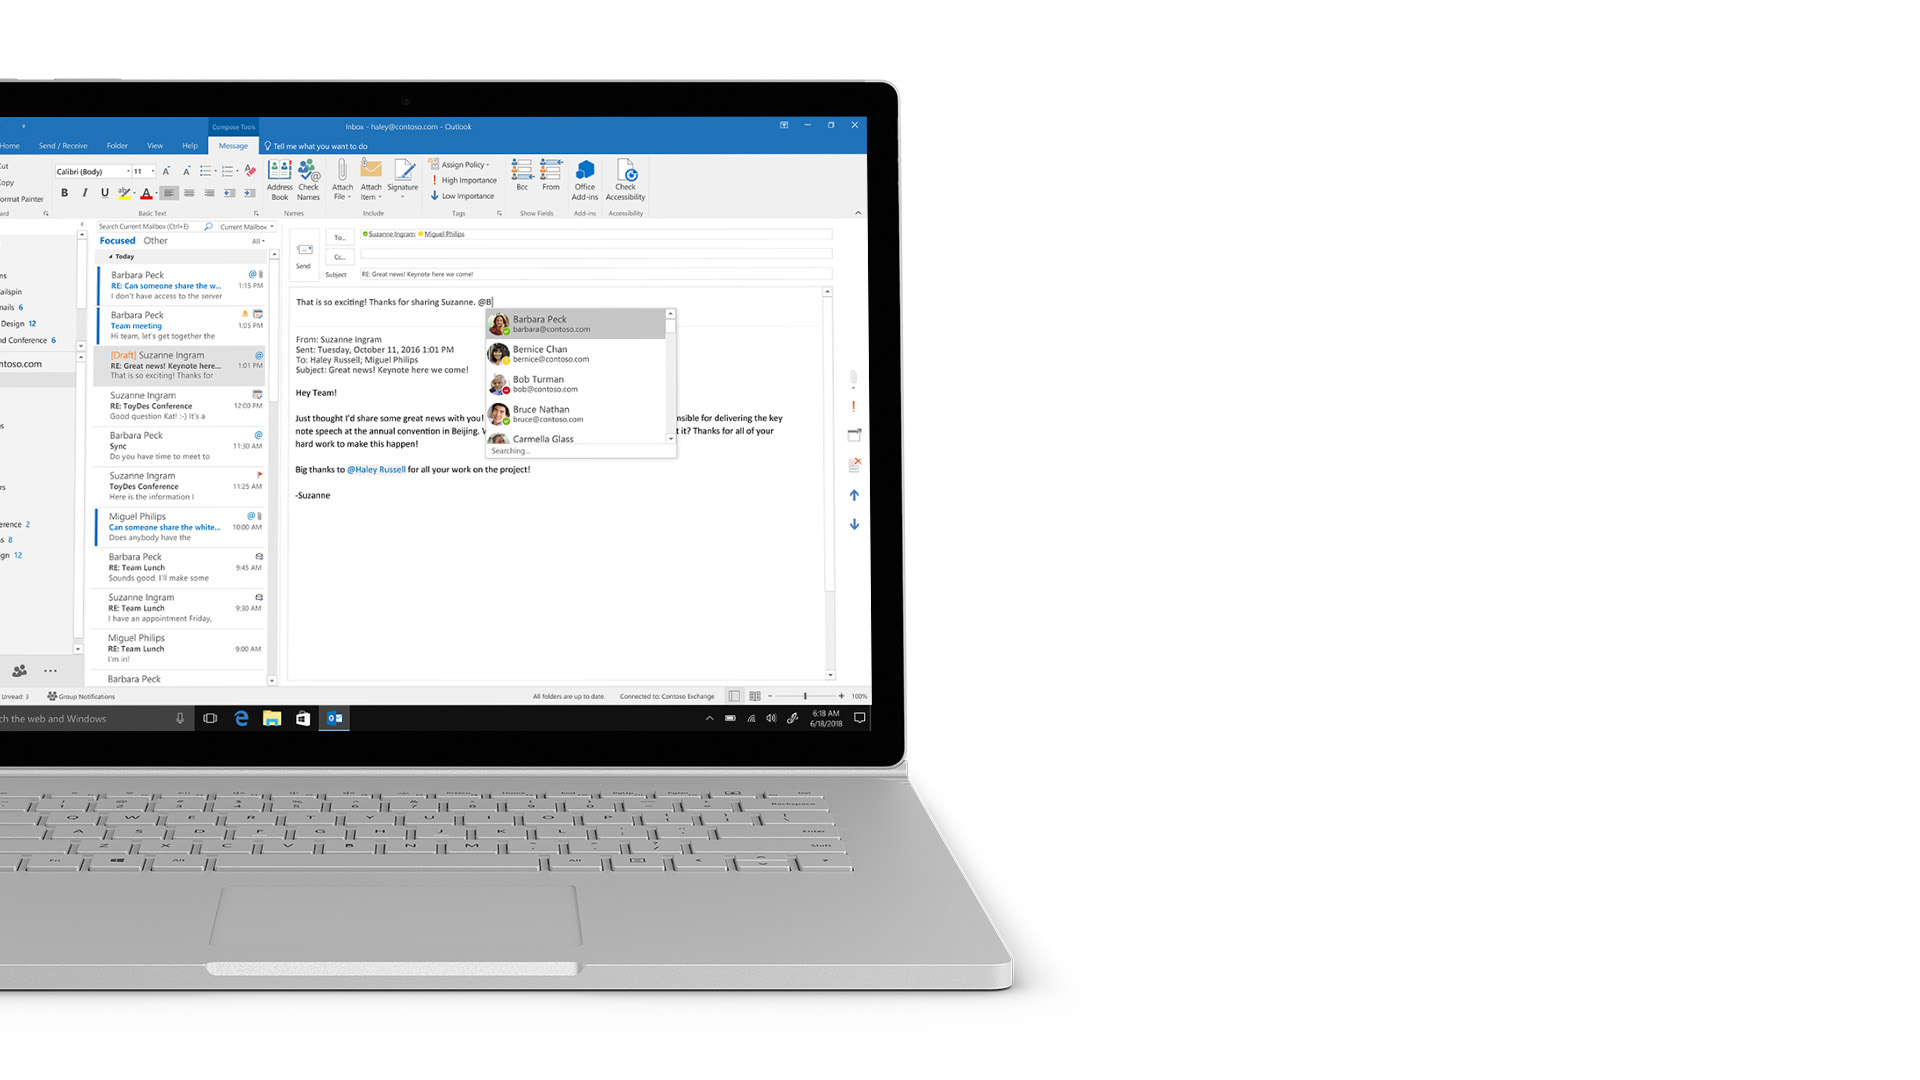 Outlook-skärmbild på Surface.